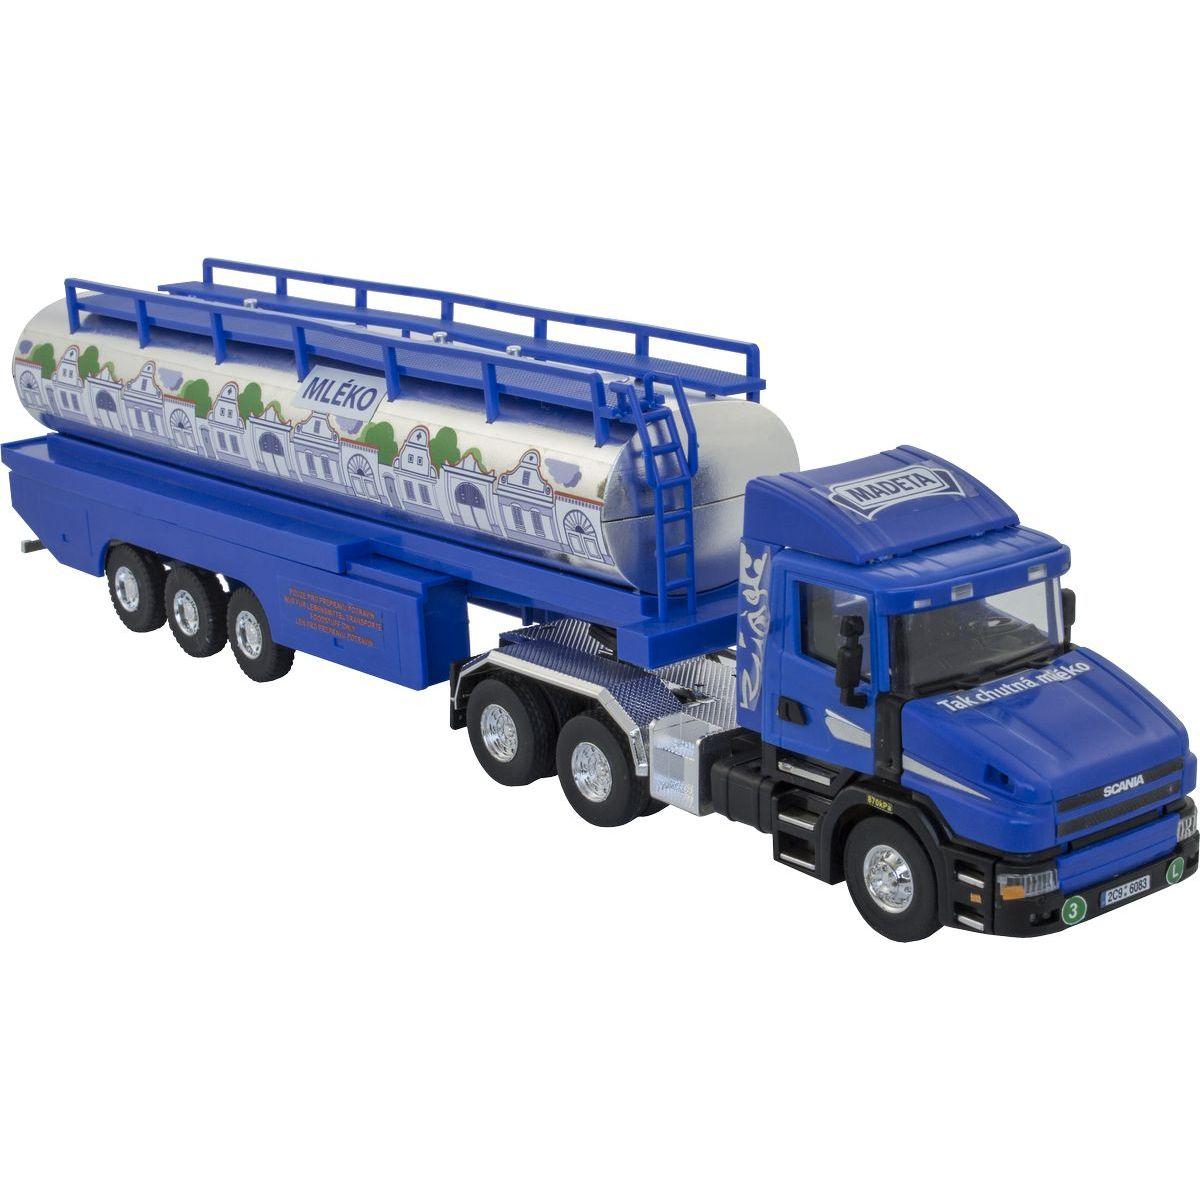 Monti System 72 Madeta Scania